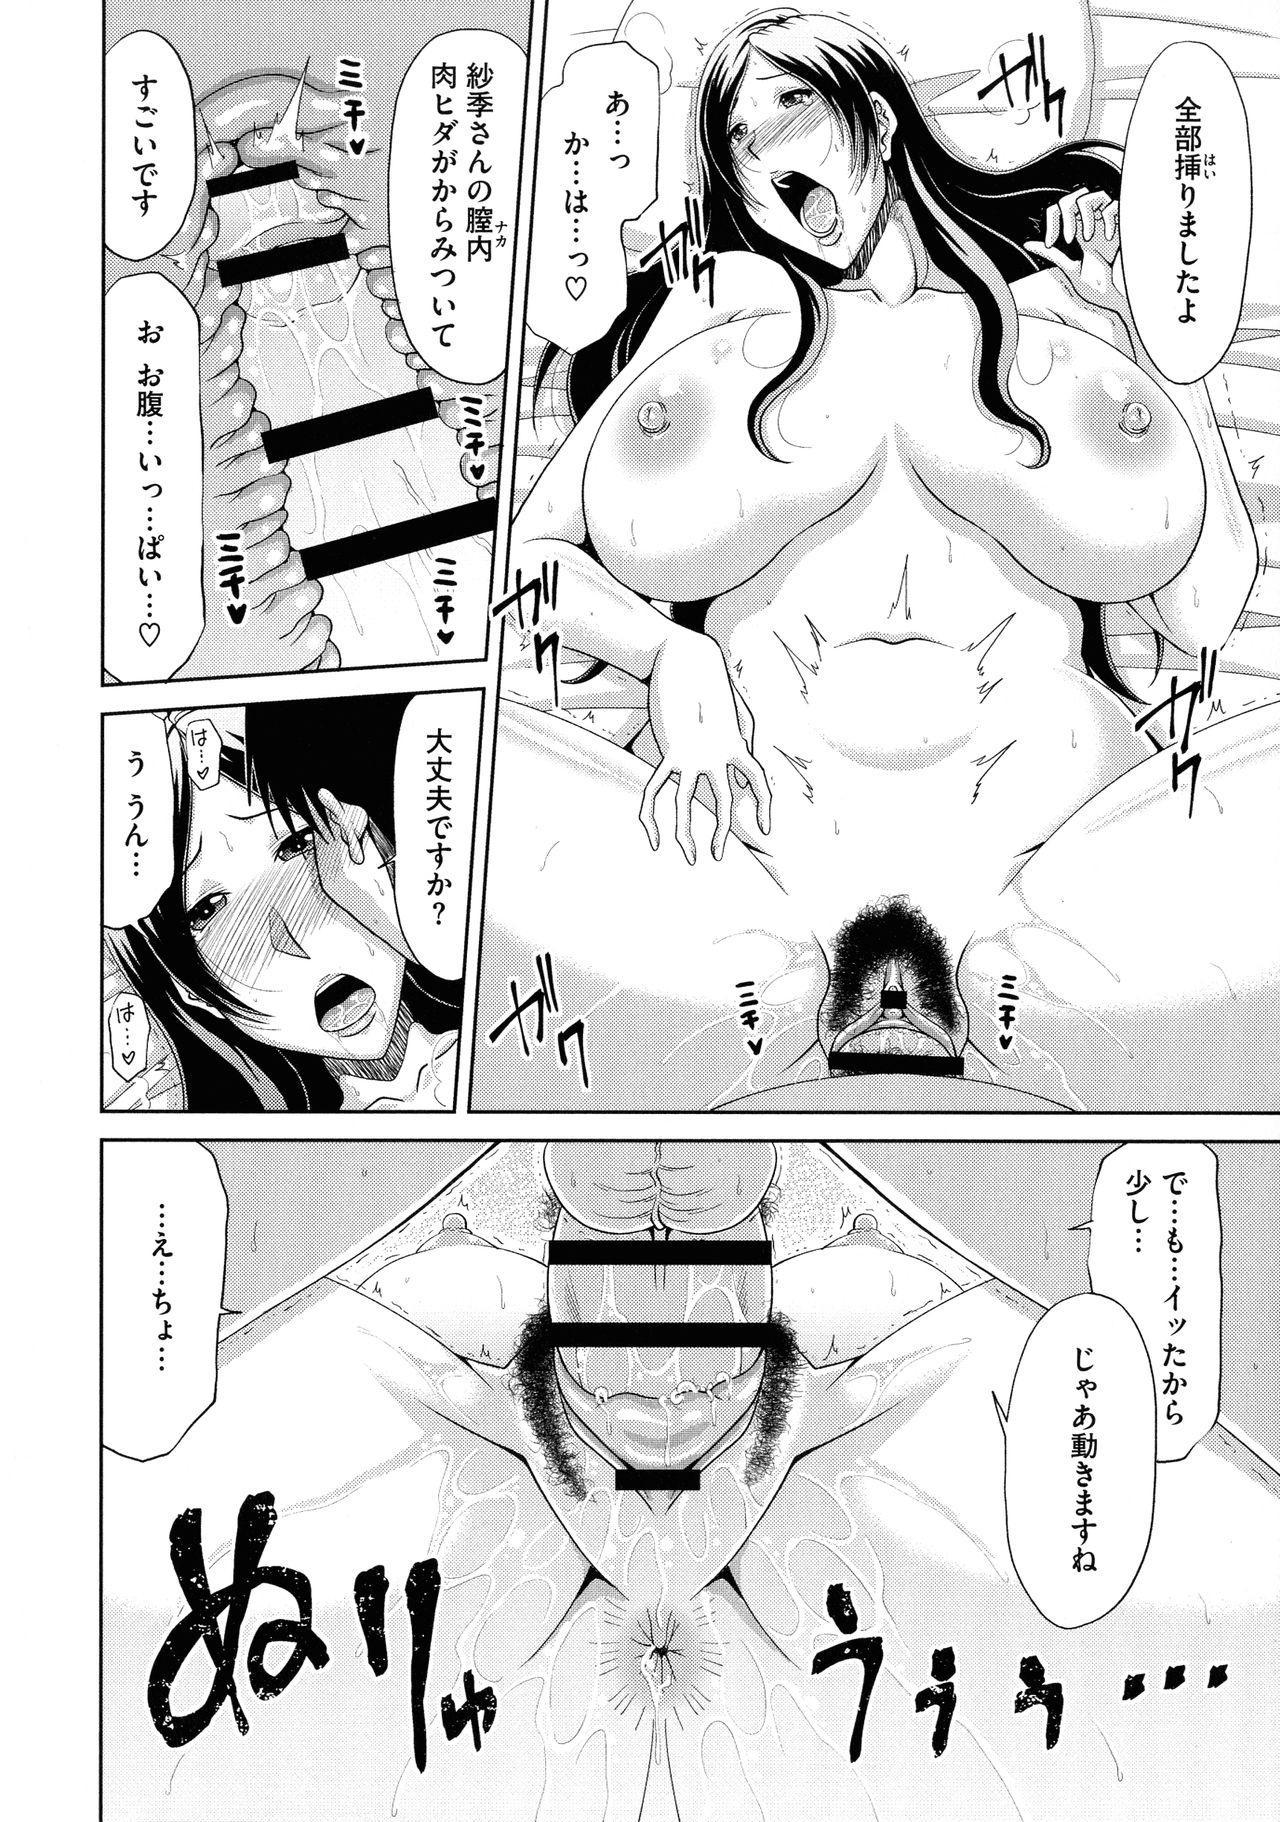 Haramase! 182